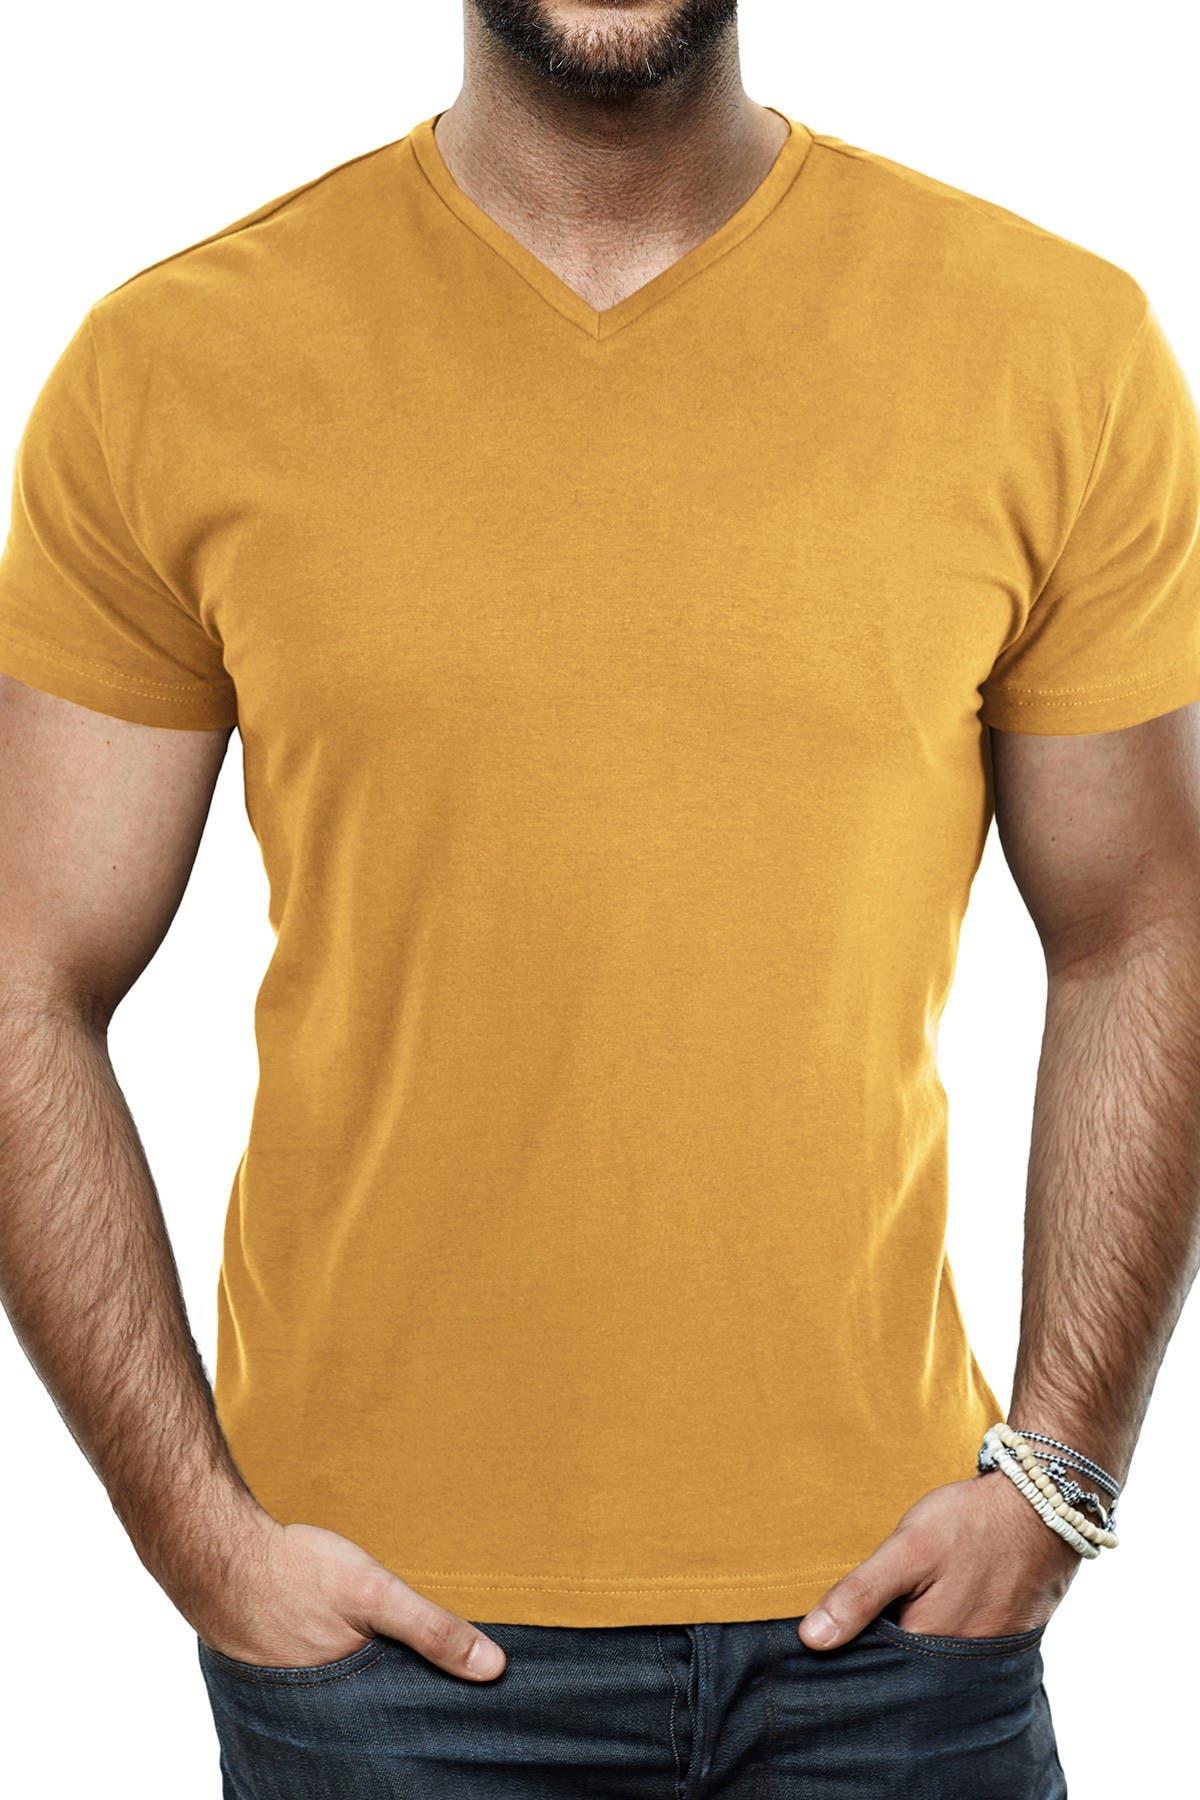 Image of XRAY Solid V-Neck Flex T-Shirt